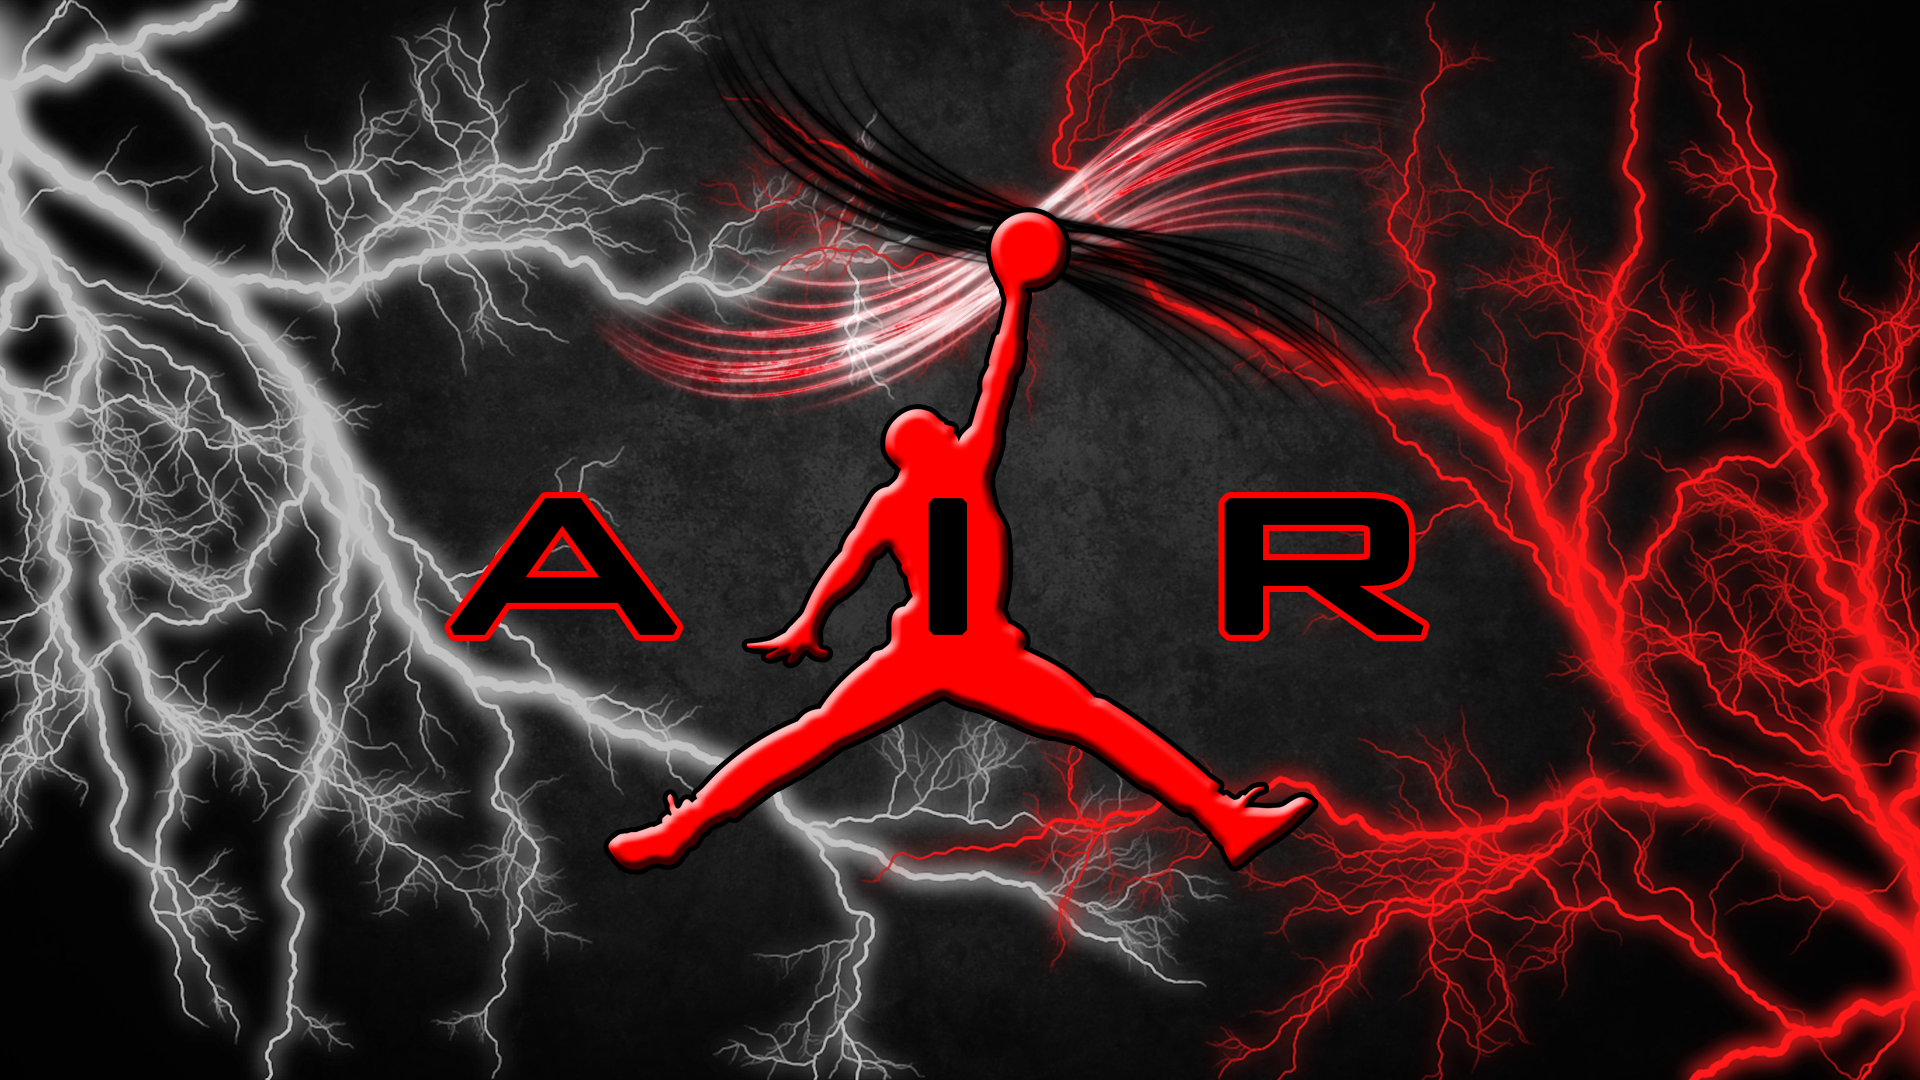 jordan 23 logo wallpaper